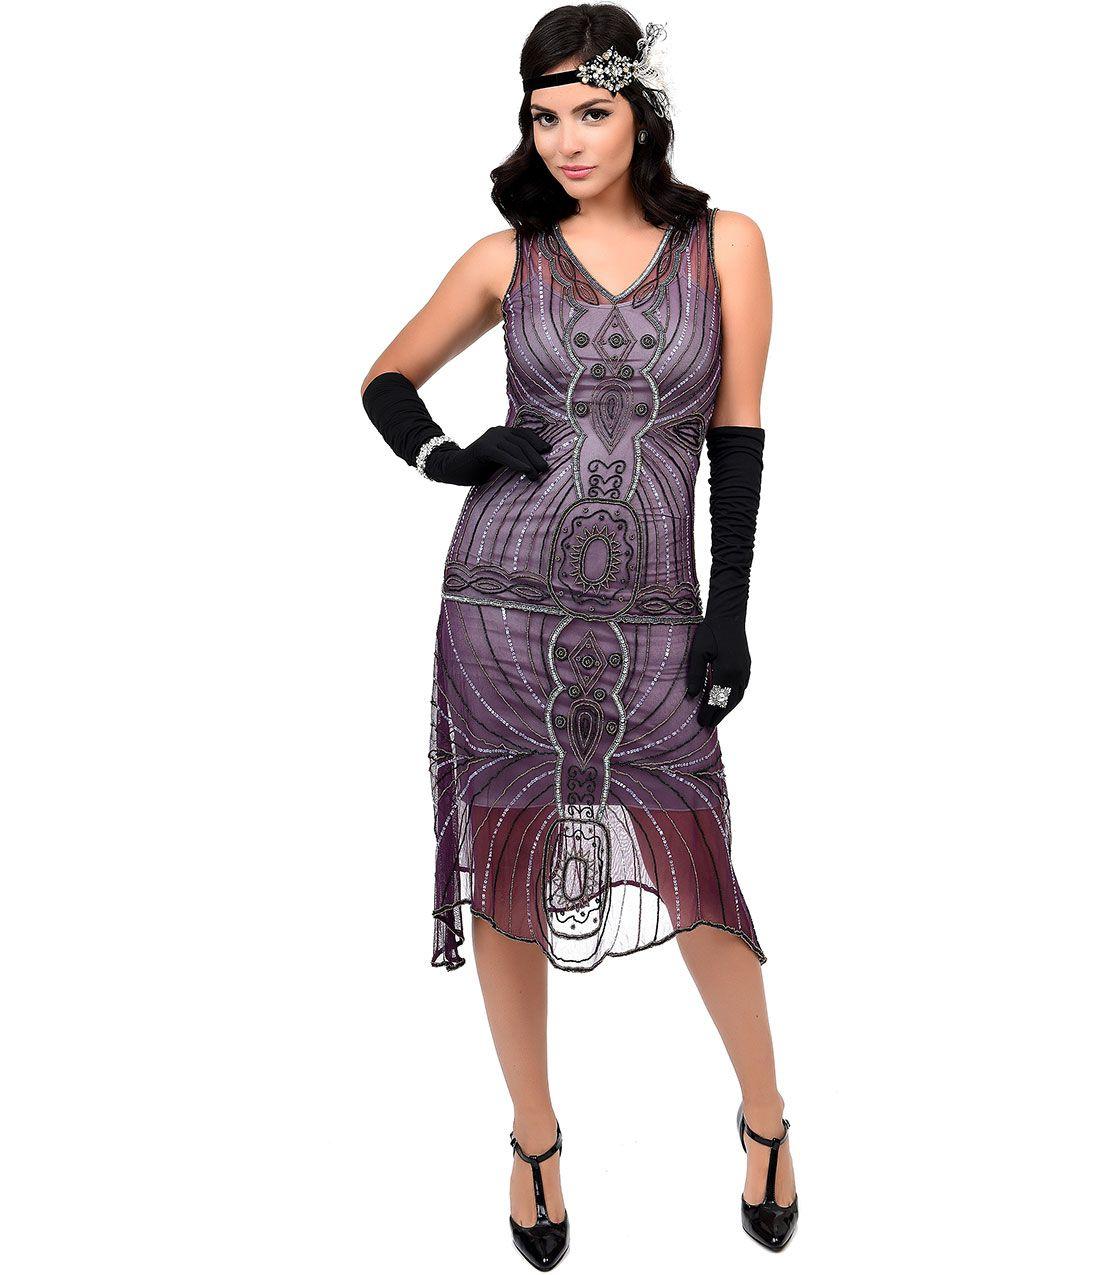 1920's Style Dresses: Flapper Dresses to Gatsby dresses | Jazz ...